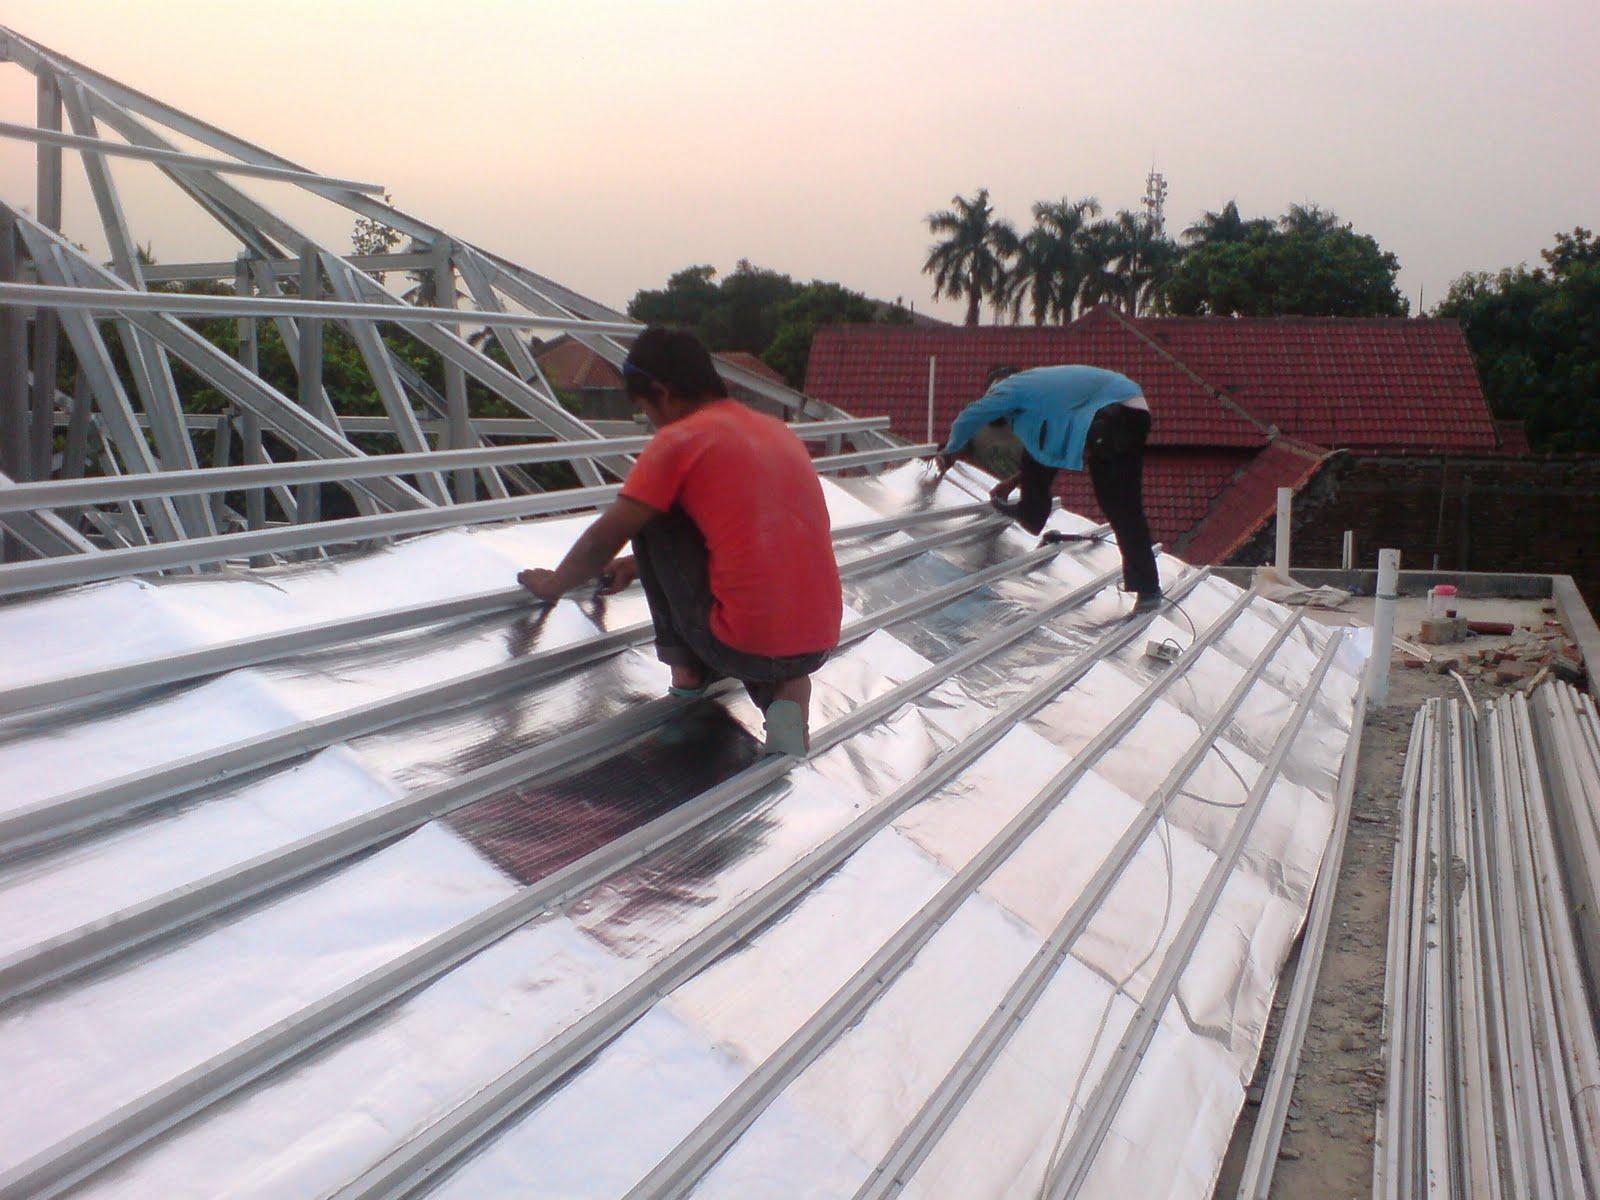 Harga Baja Ringan Murah Di Tangerang - Garuda: Paket Ringan, Alminium ...